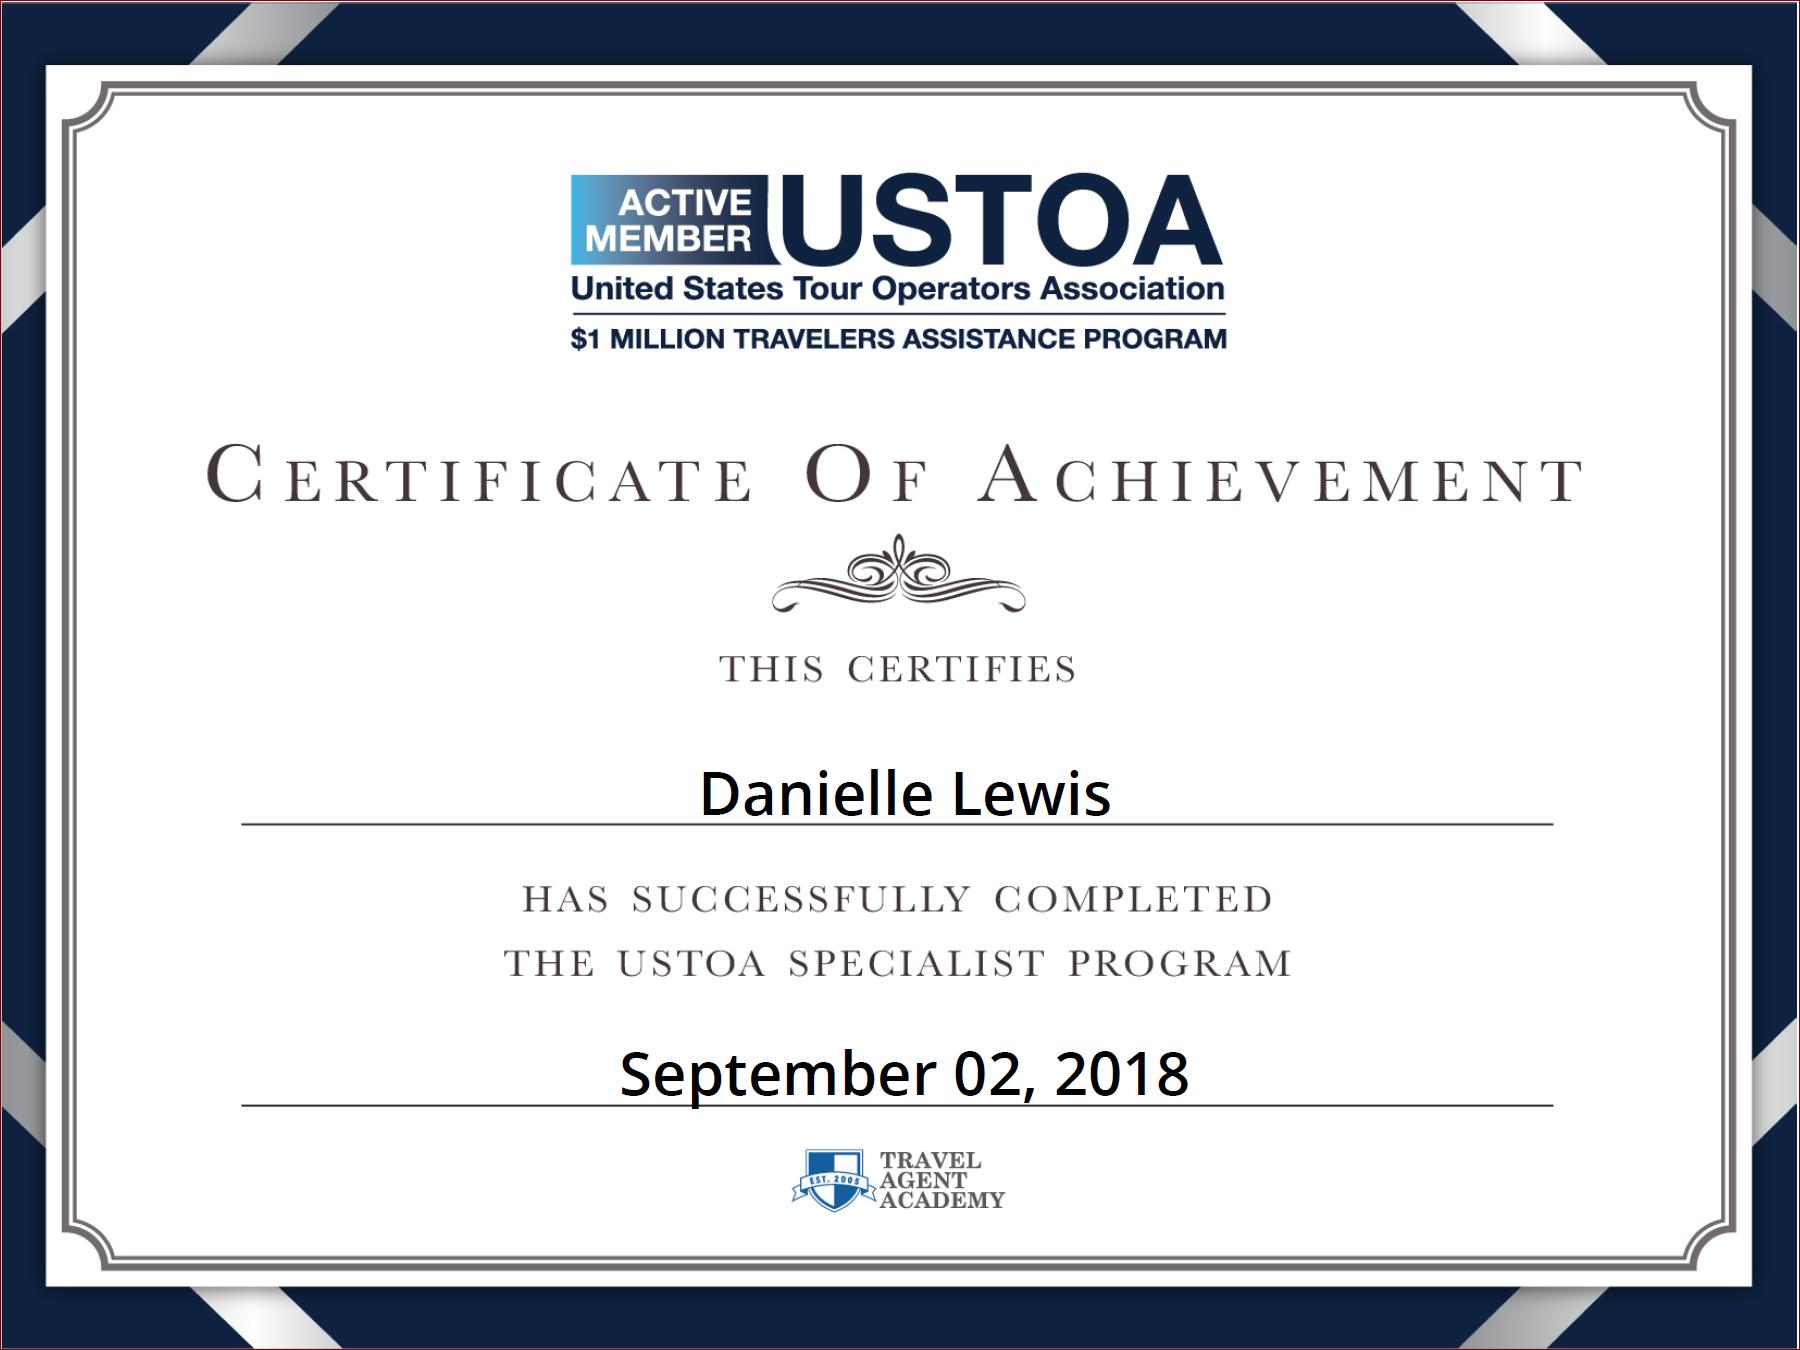 SelfishMe Travel - USTOA (United States Tour Operators Association) Specialist Certificate of Achievement